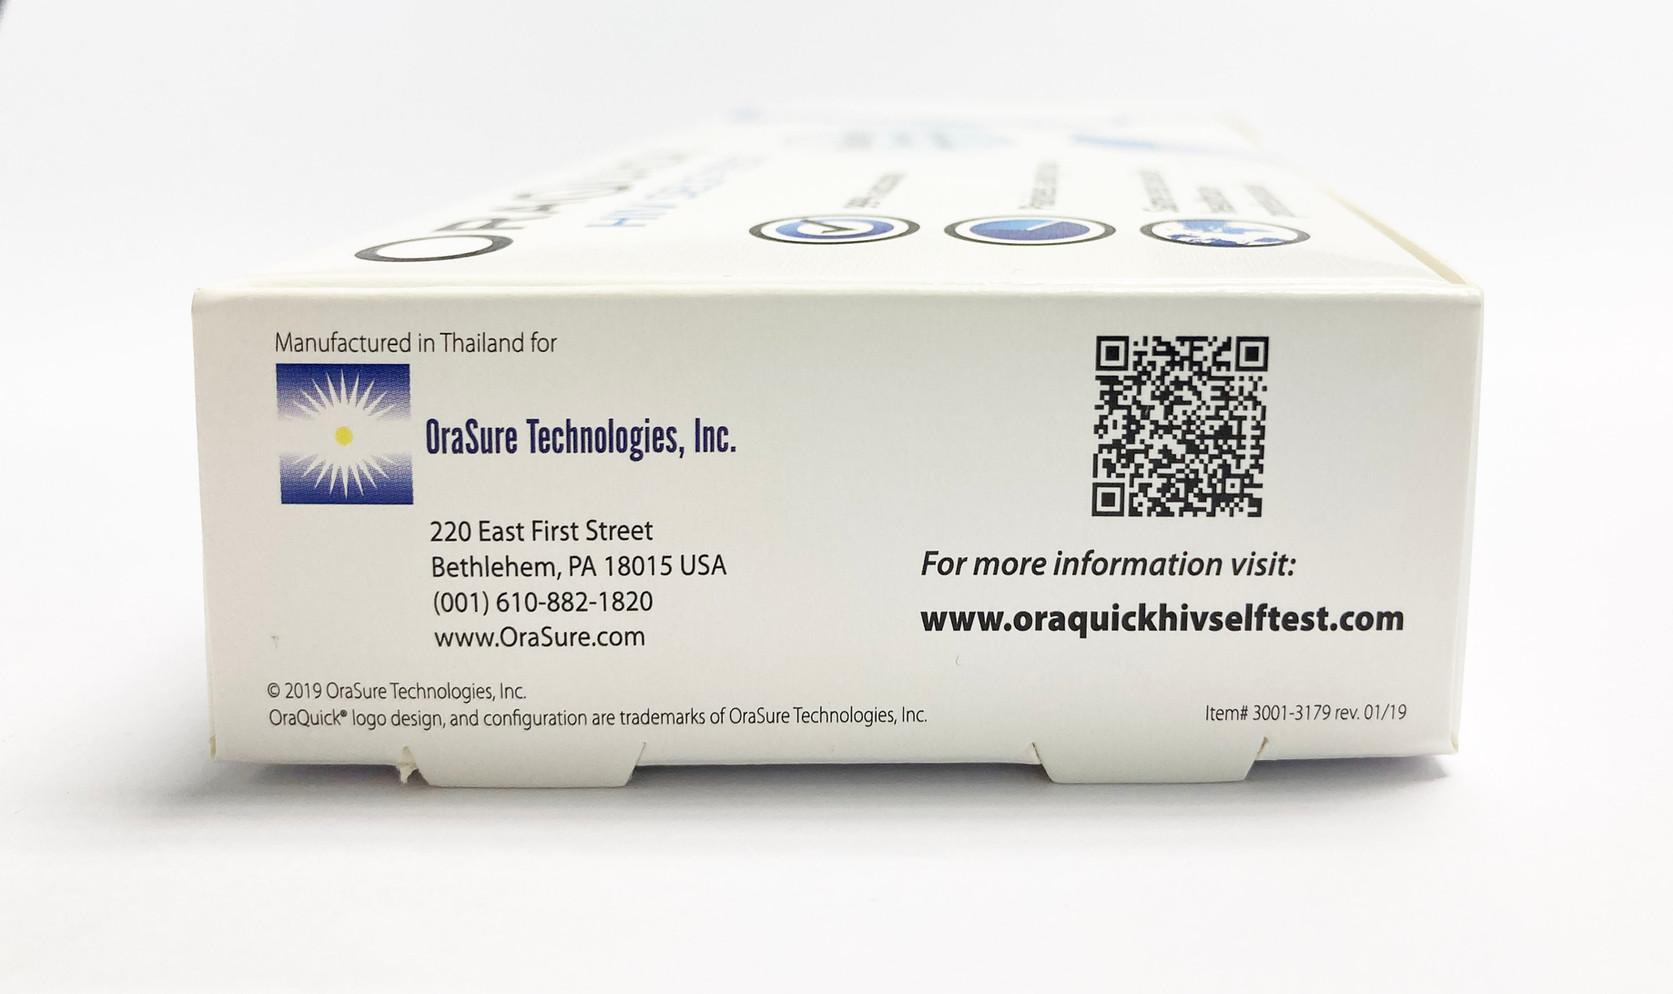 Oraquick HIV Self Test